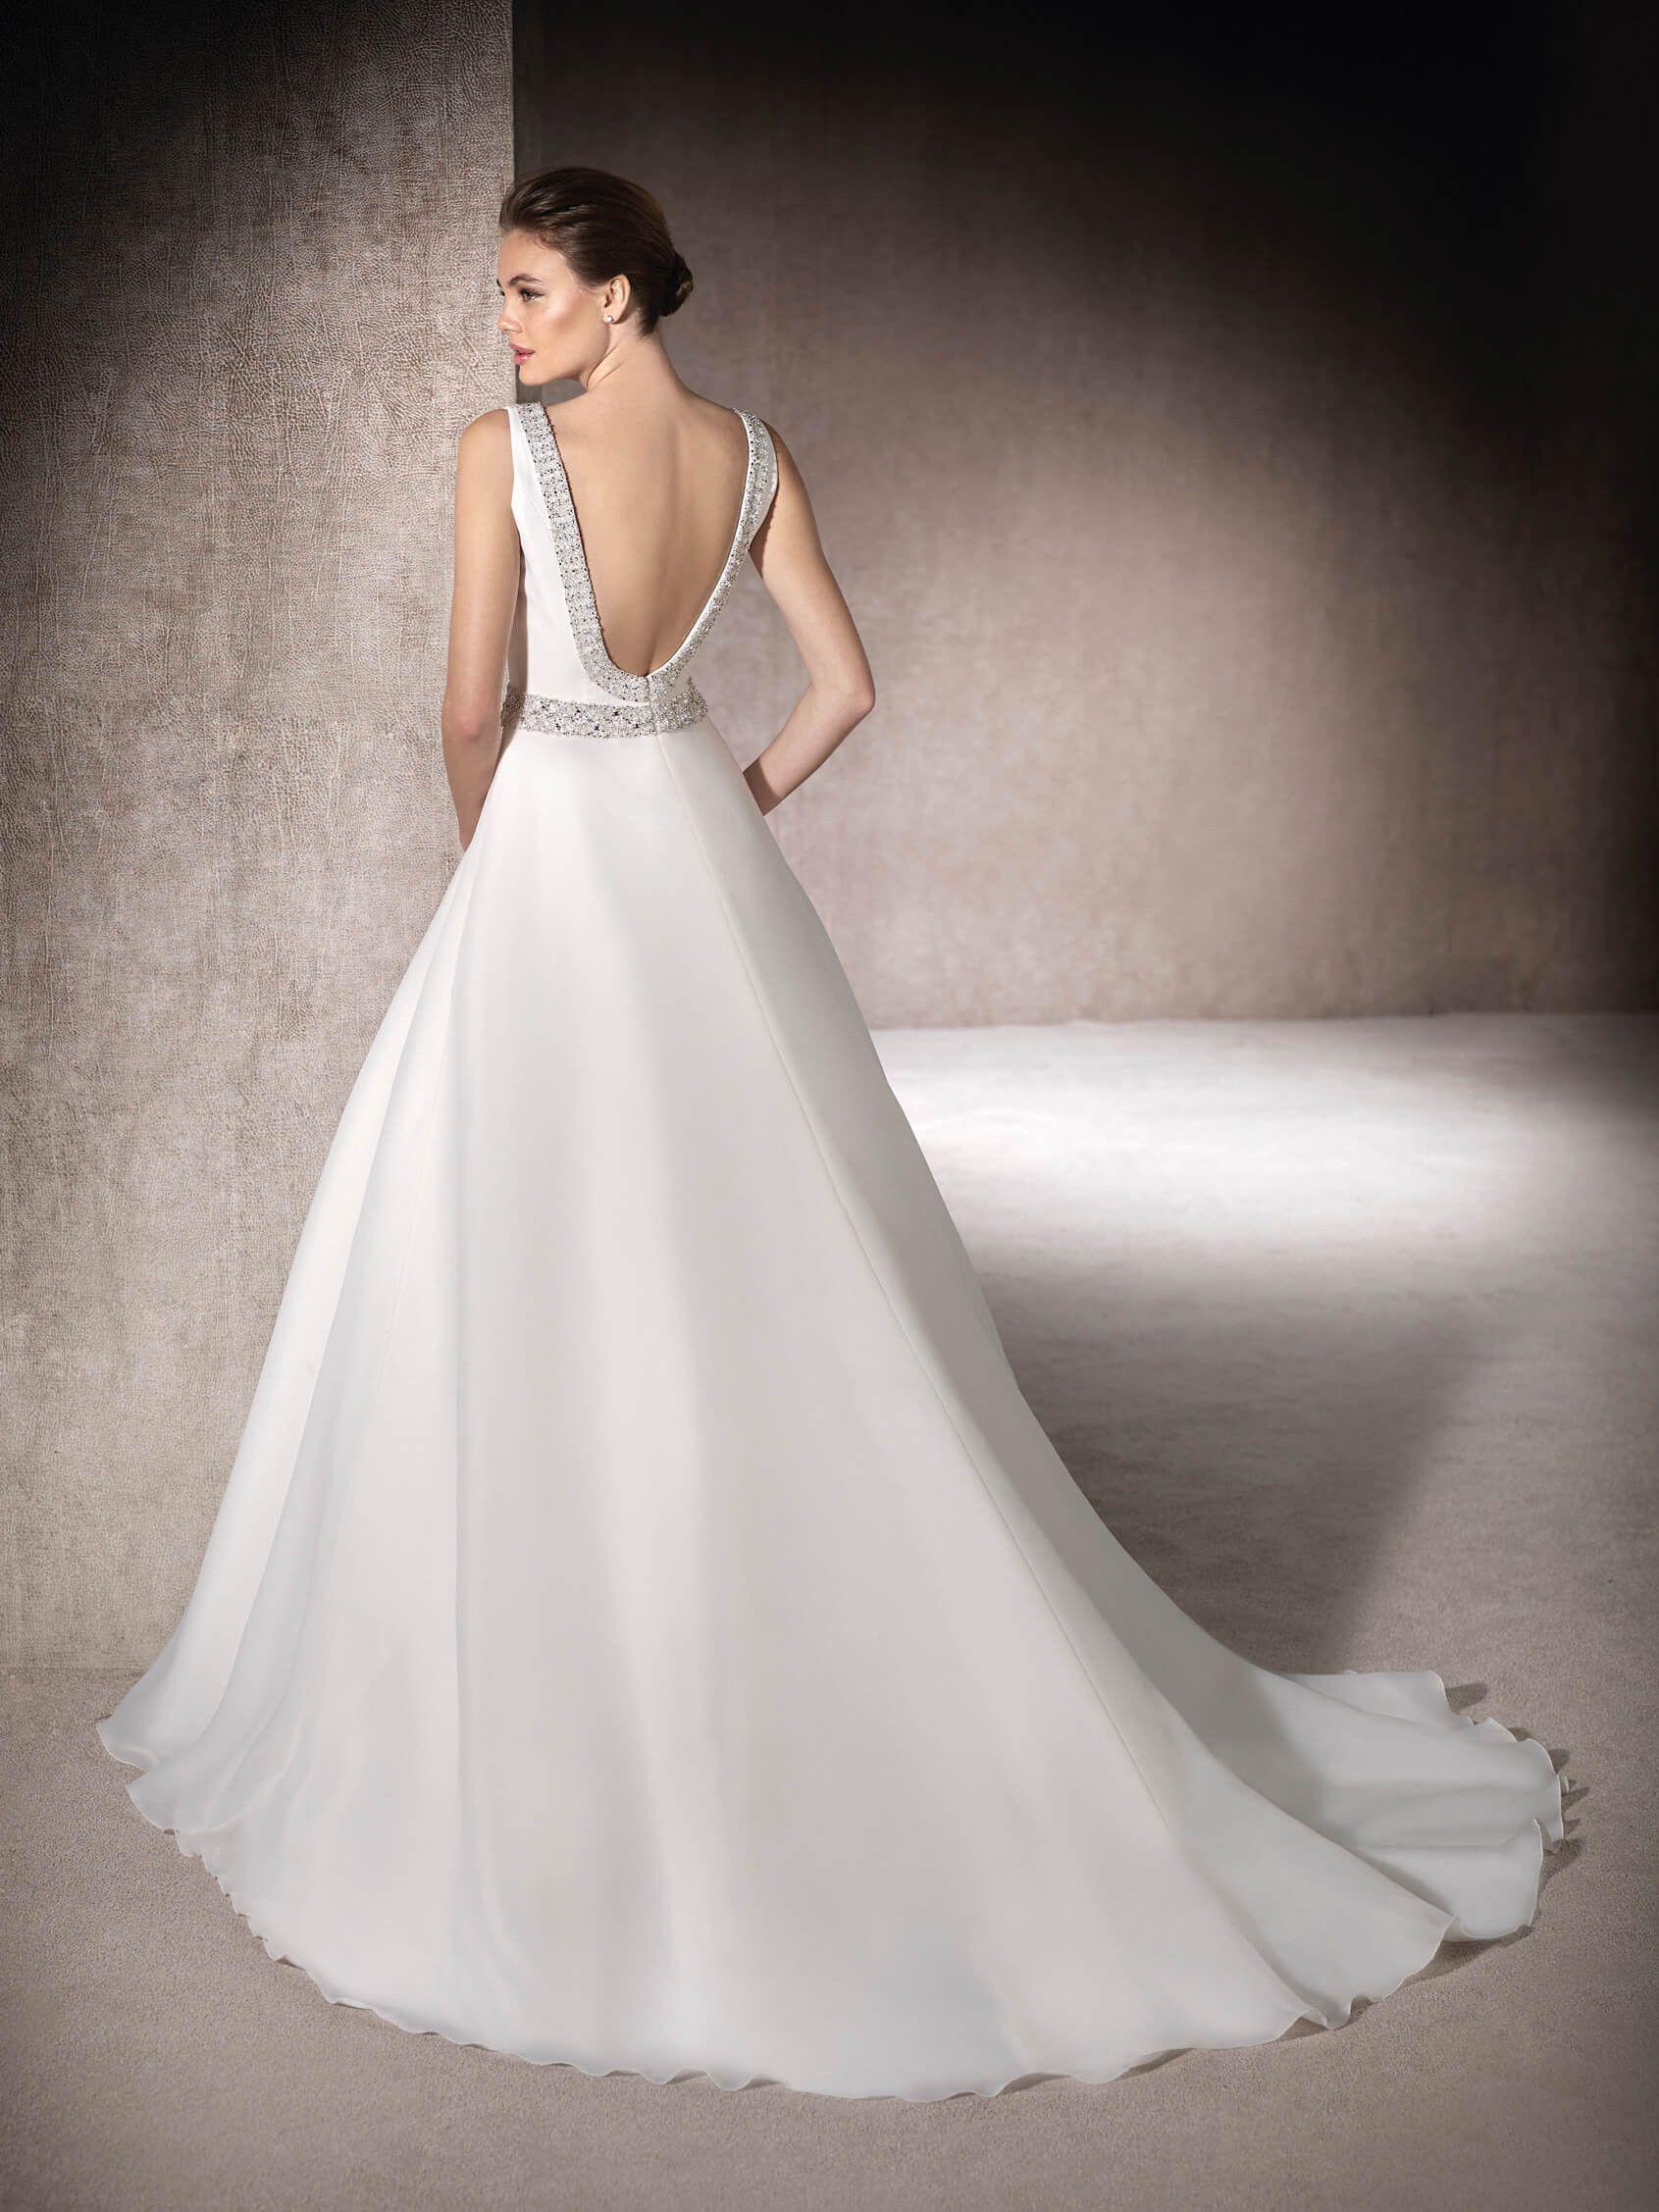 MELBA is a majestic wedding dress in garza with delicate gemstones ...